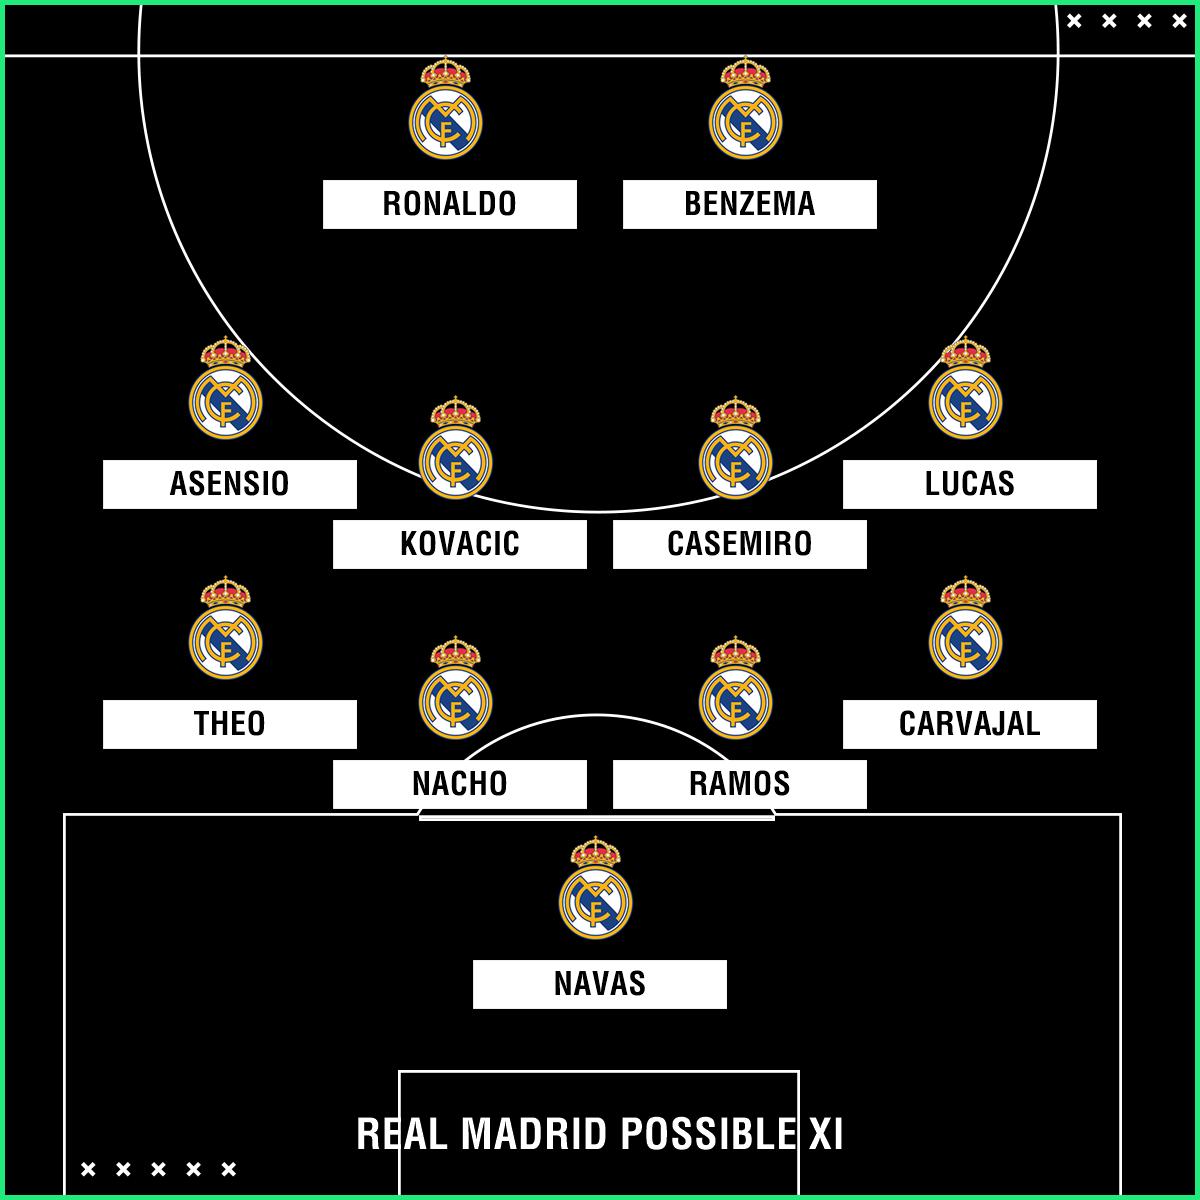 Real Madrid possible Espanyol